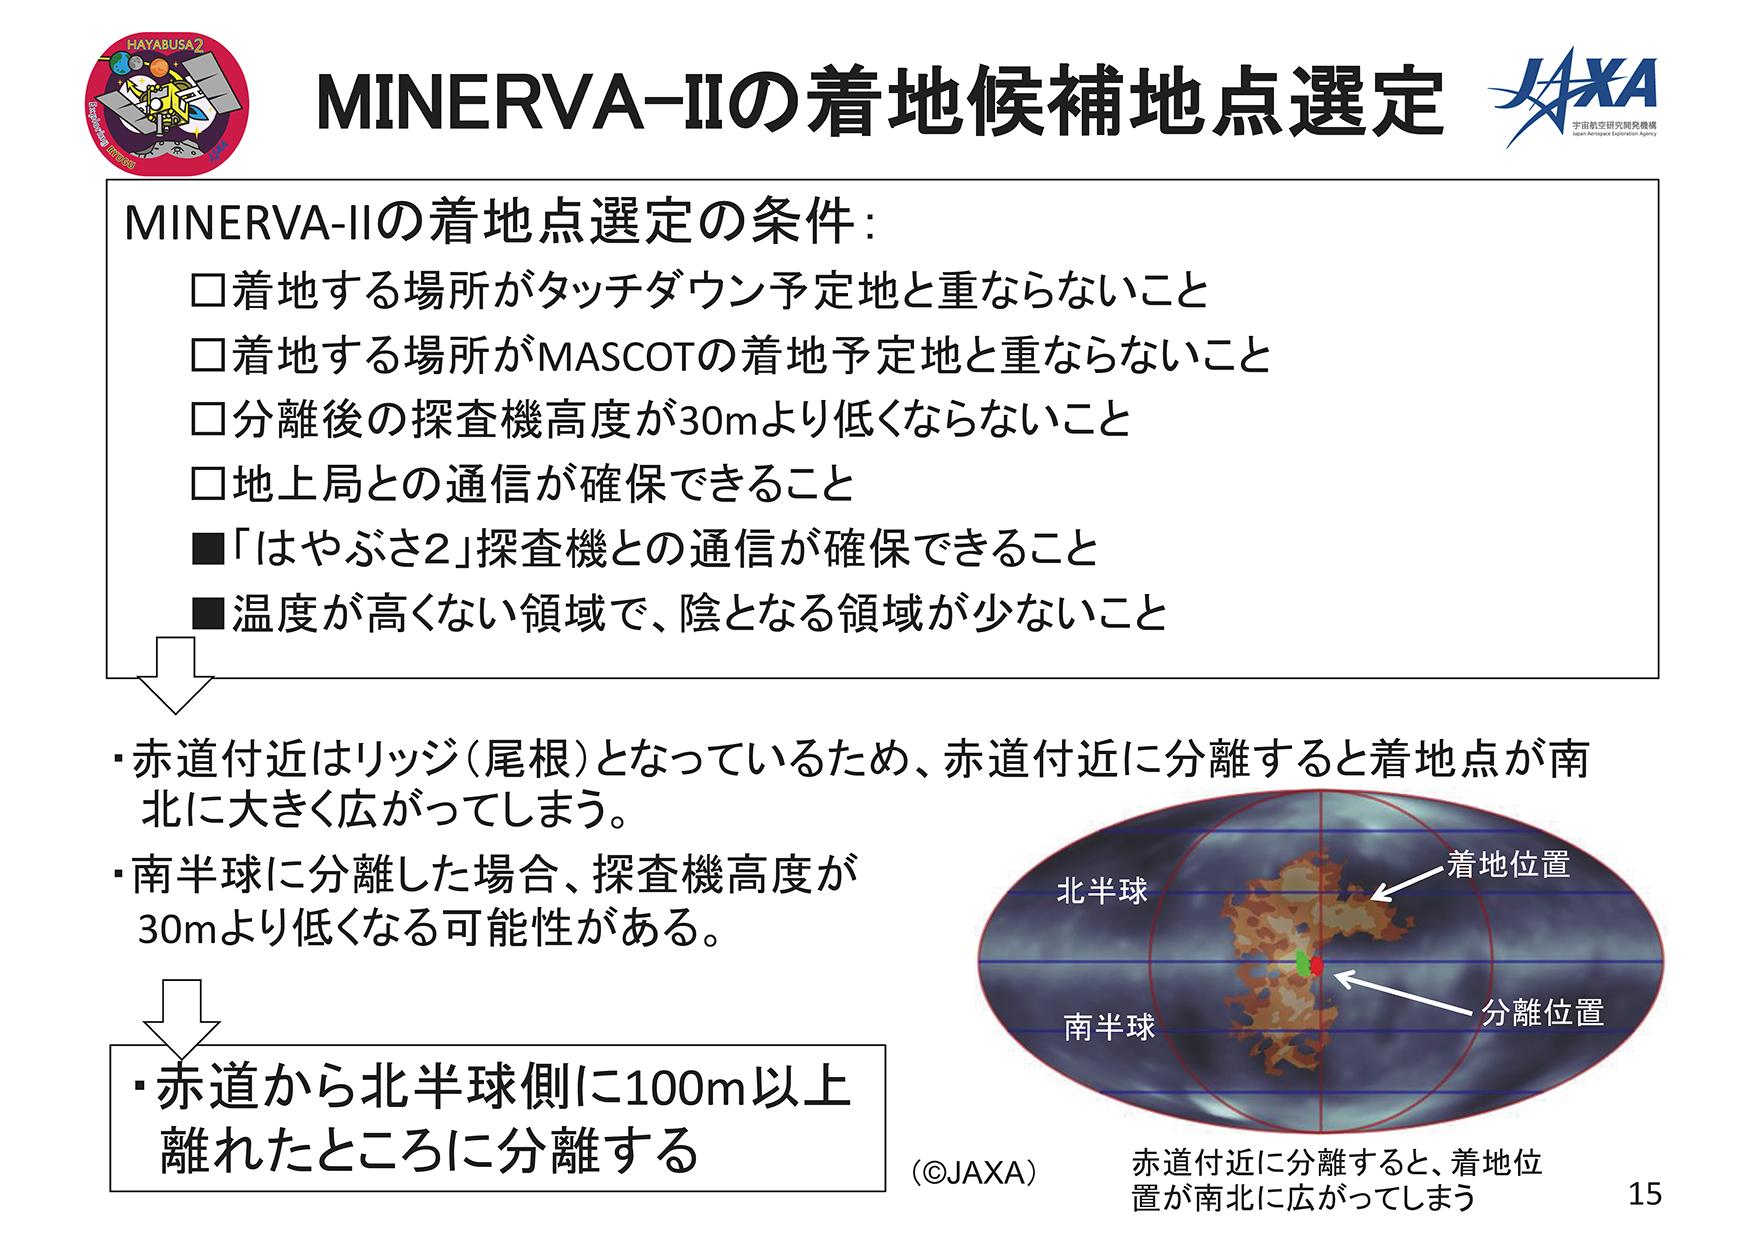 f:id:Imamura:20180921145505p:plain